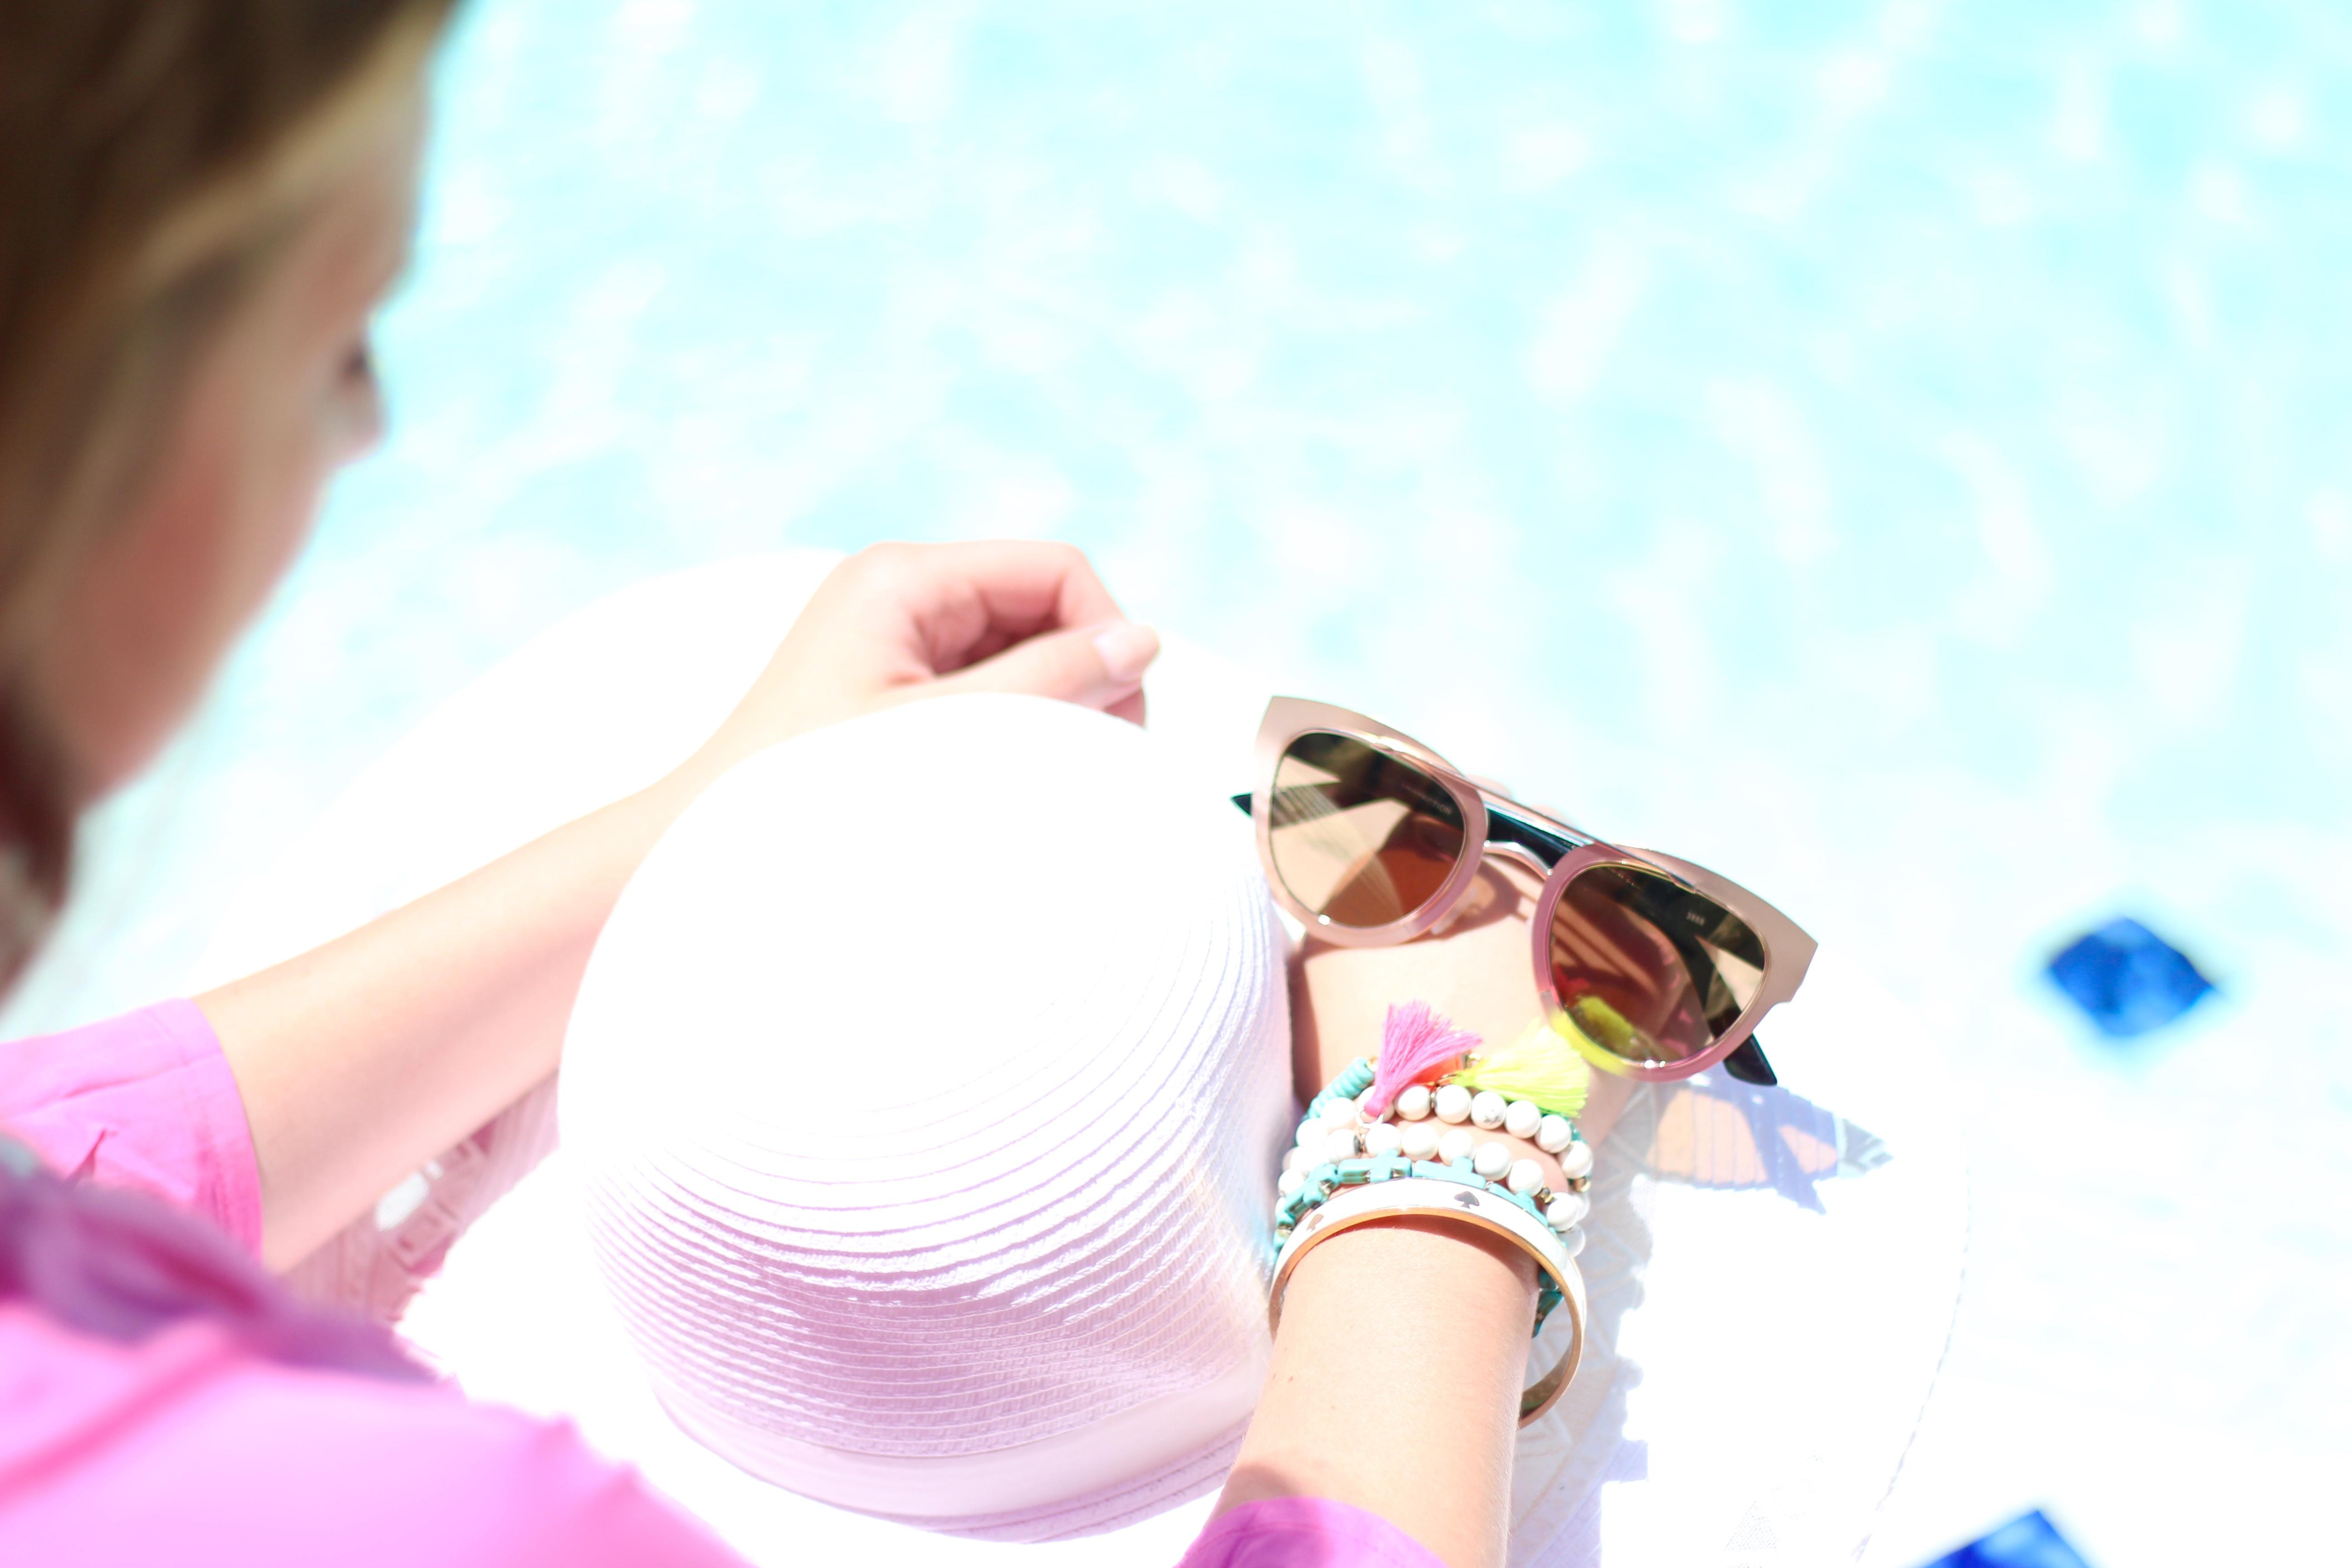 poolside details | Audrey Madison Stowe Blog